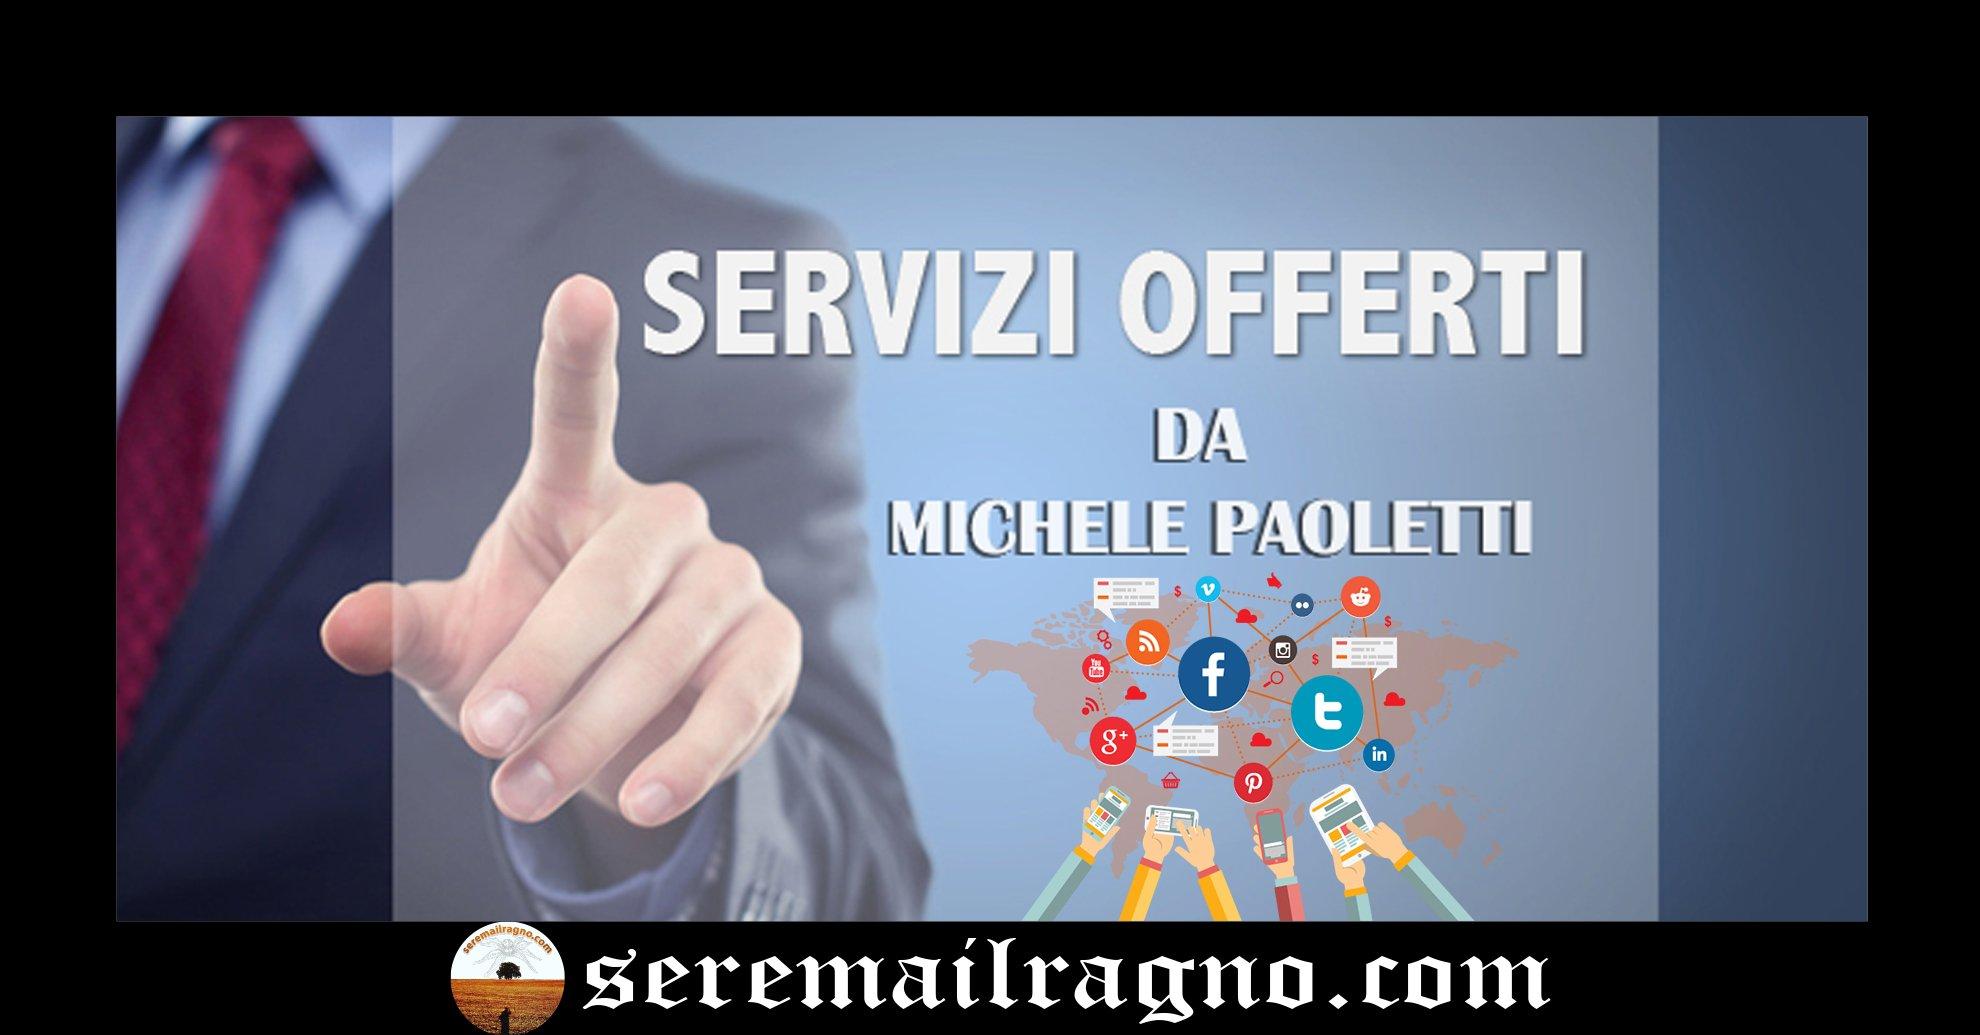 Digital Web Marketing: Servizi offerti